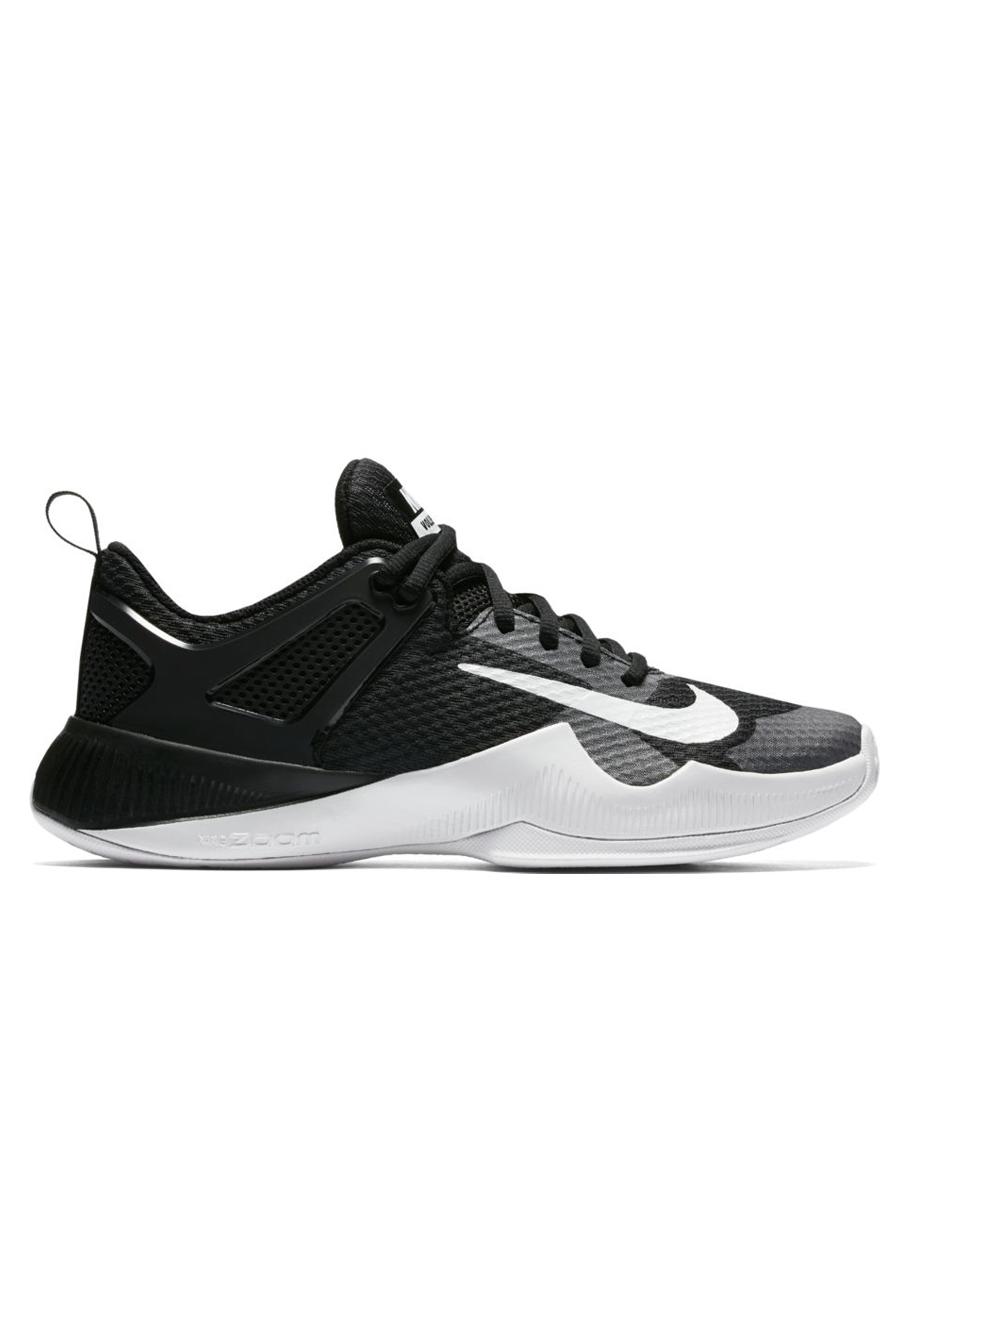 37626917e301 Women s Nike Air Zoom Hyperace Shoe - Black White